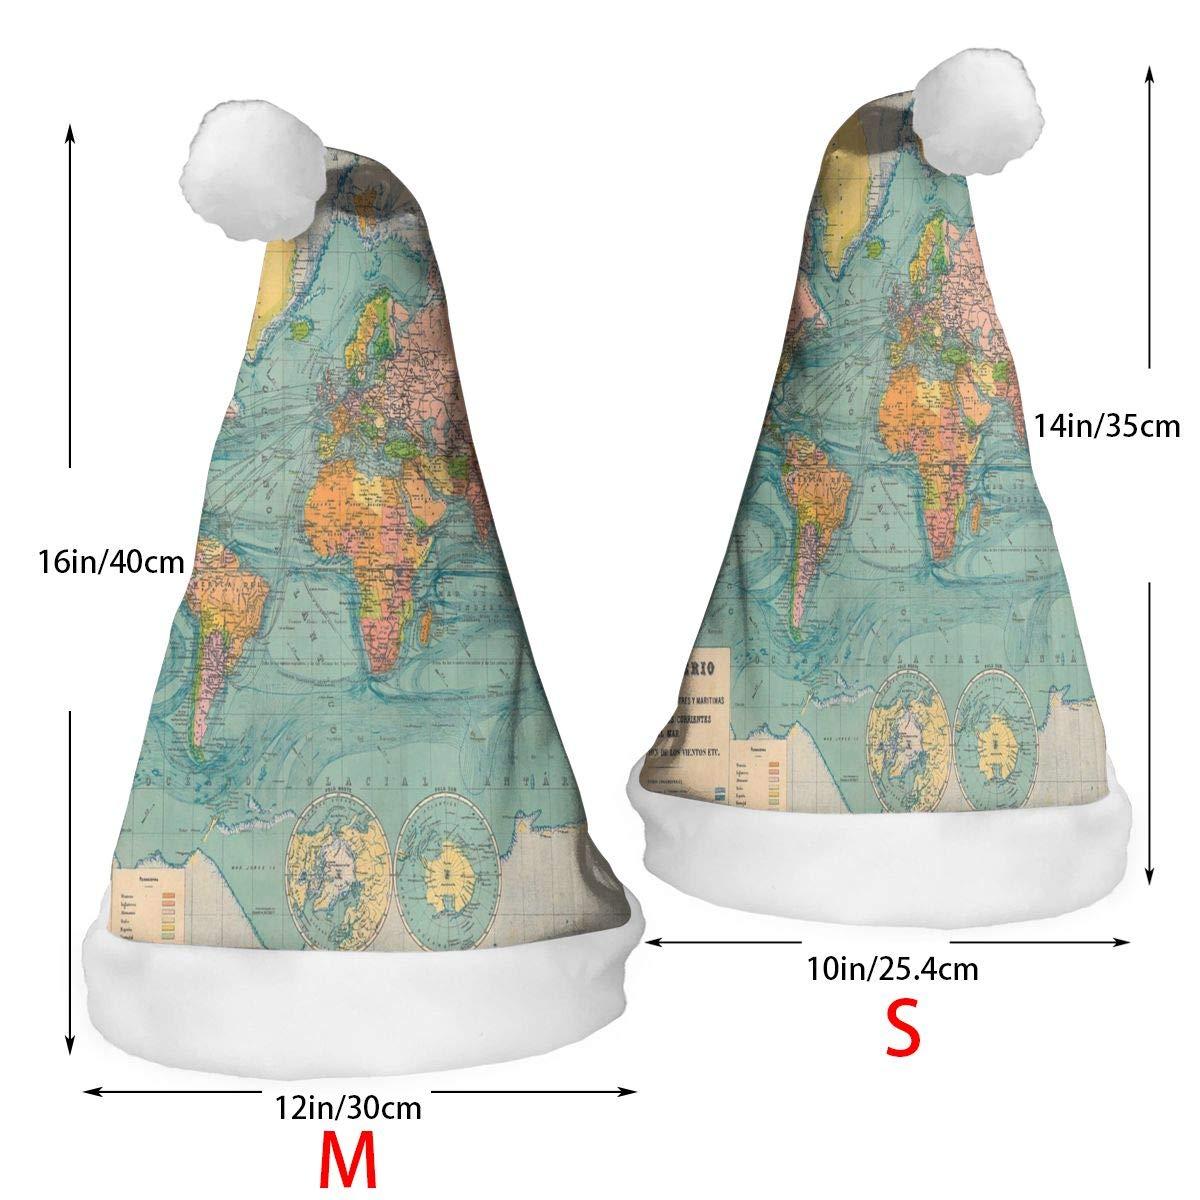 SHNUFHBD 2 Pcs Decor Christmas Hat Antique World Map Santa Xmas Cap Holiday Decorations